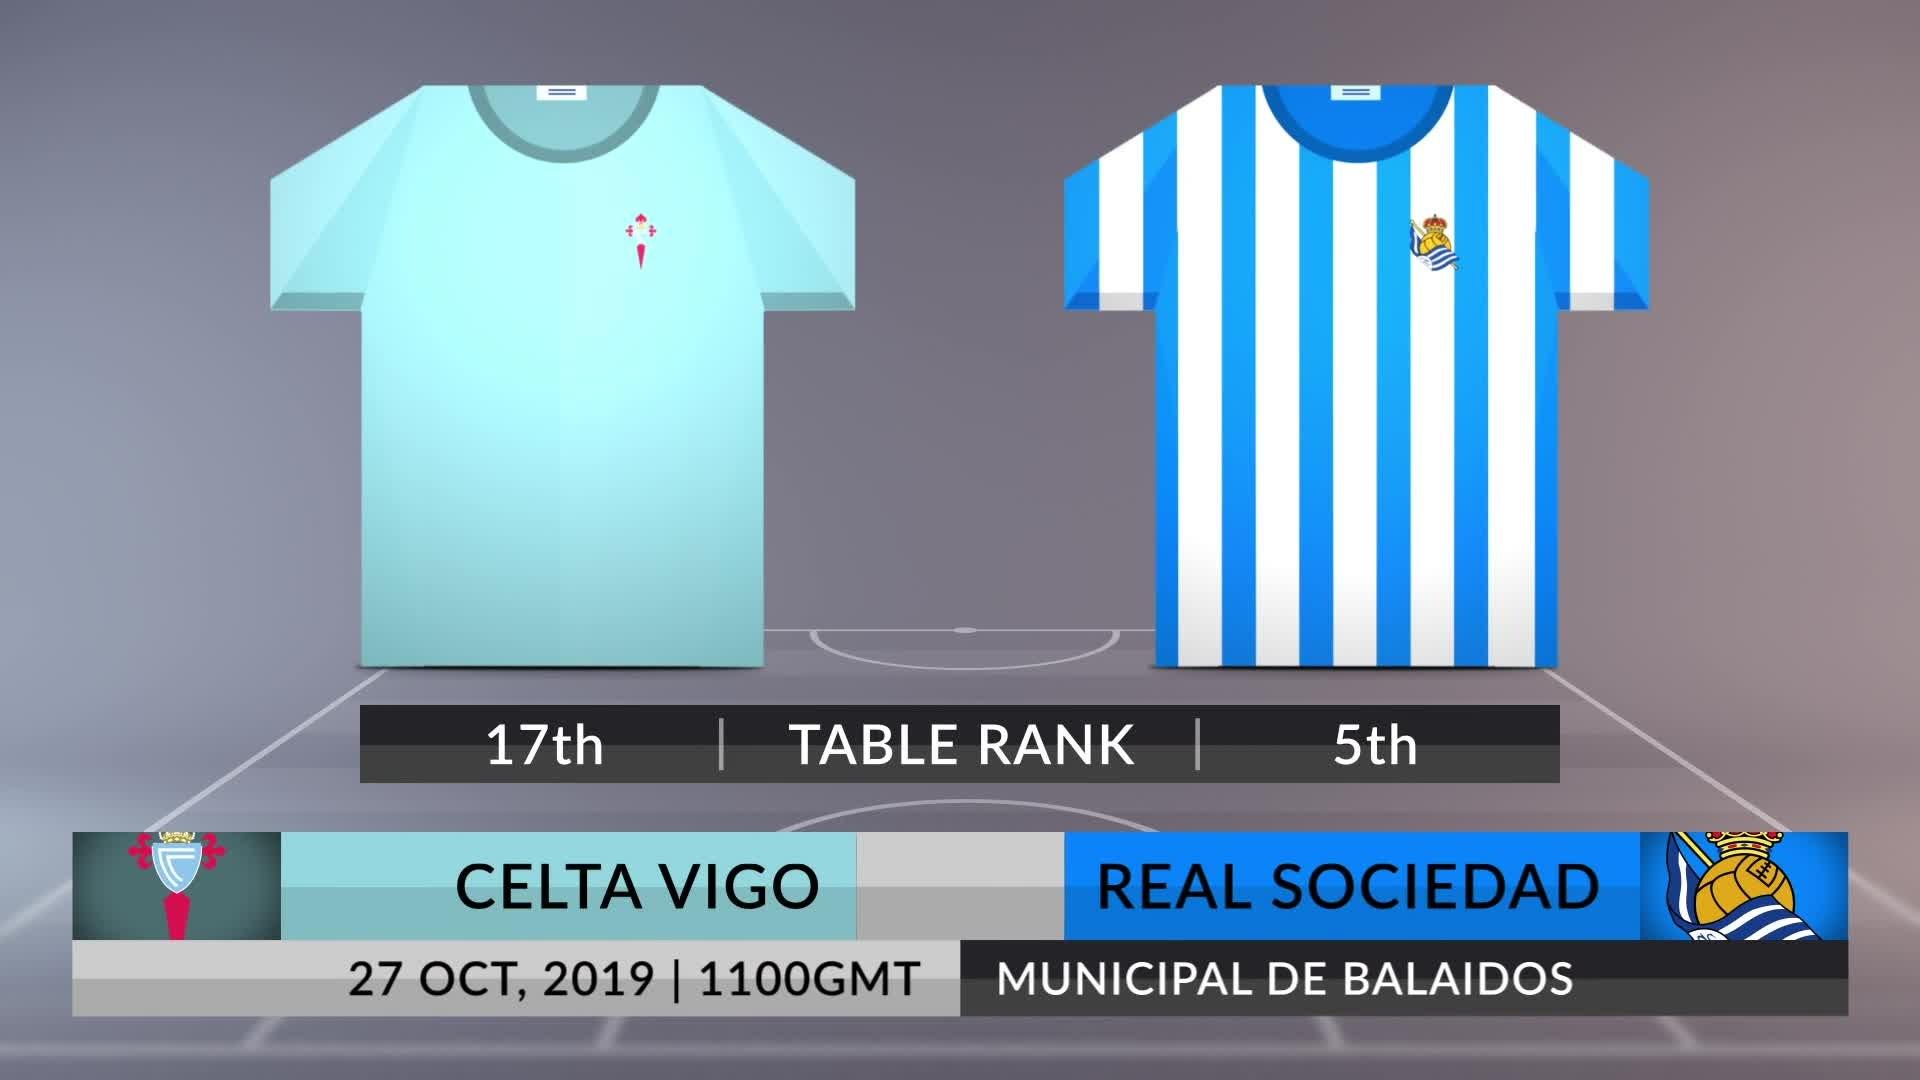 Match Preview: Celta Vigo vs Real Sociedad on 27/10/2019